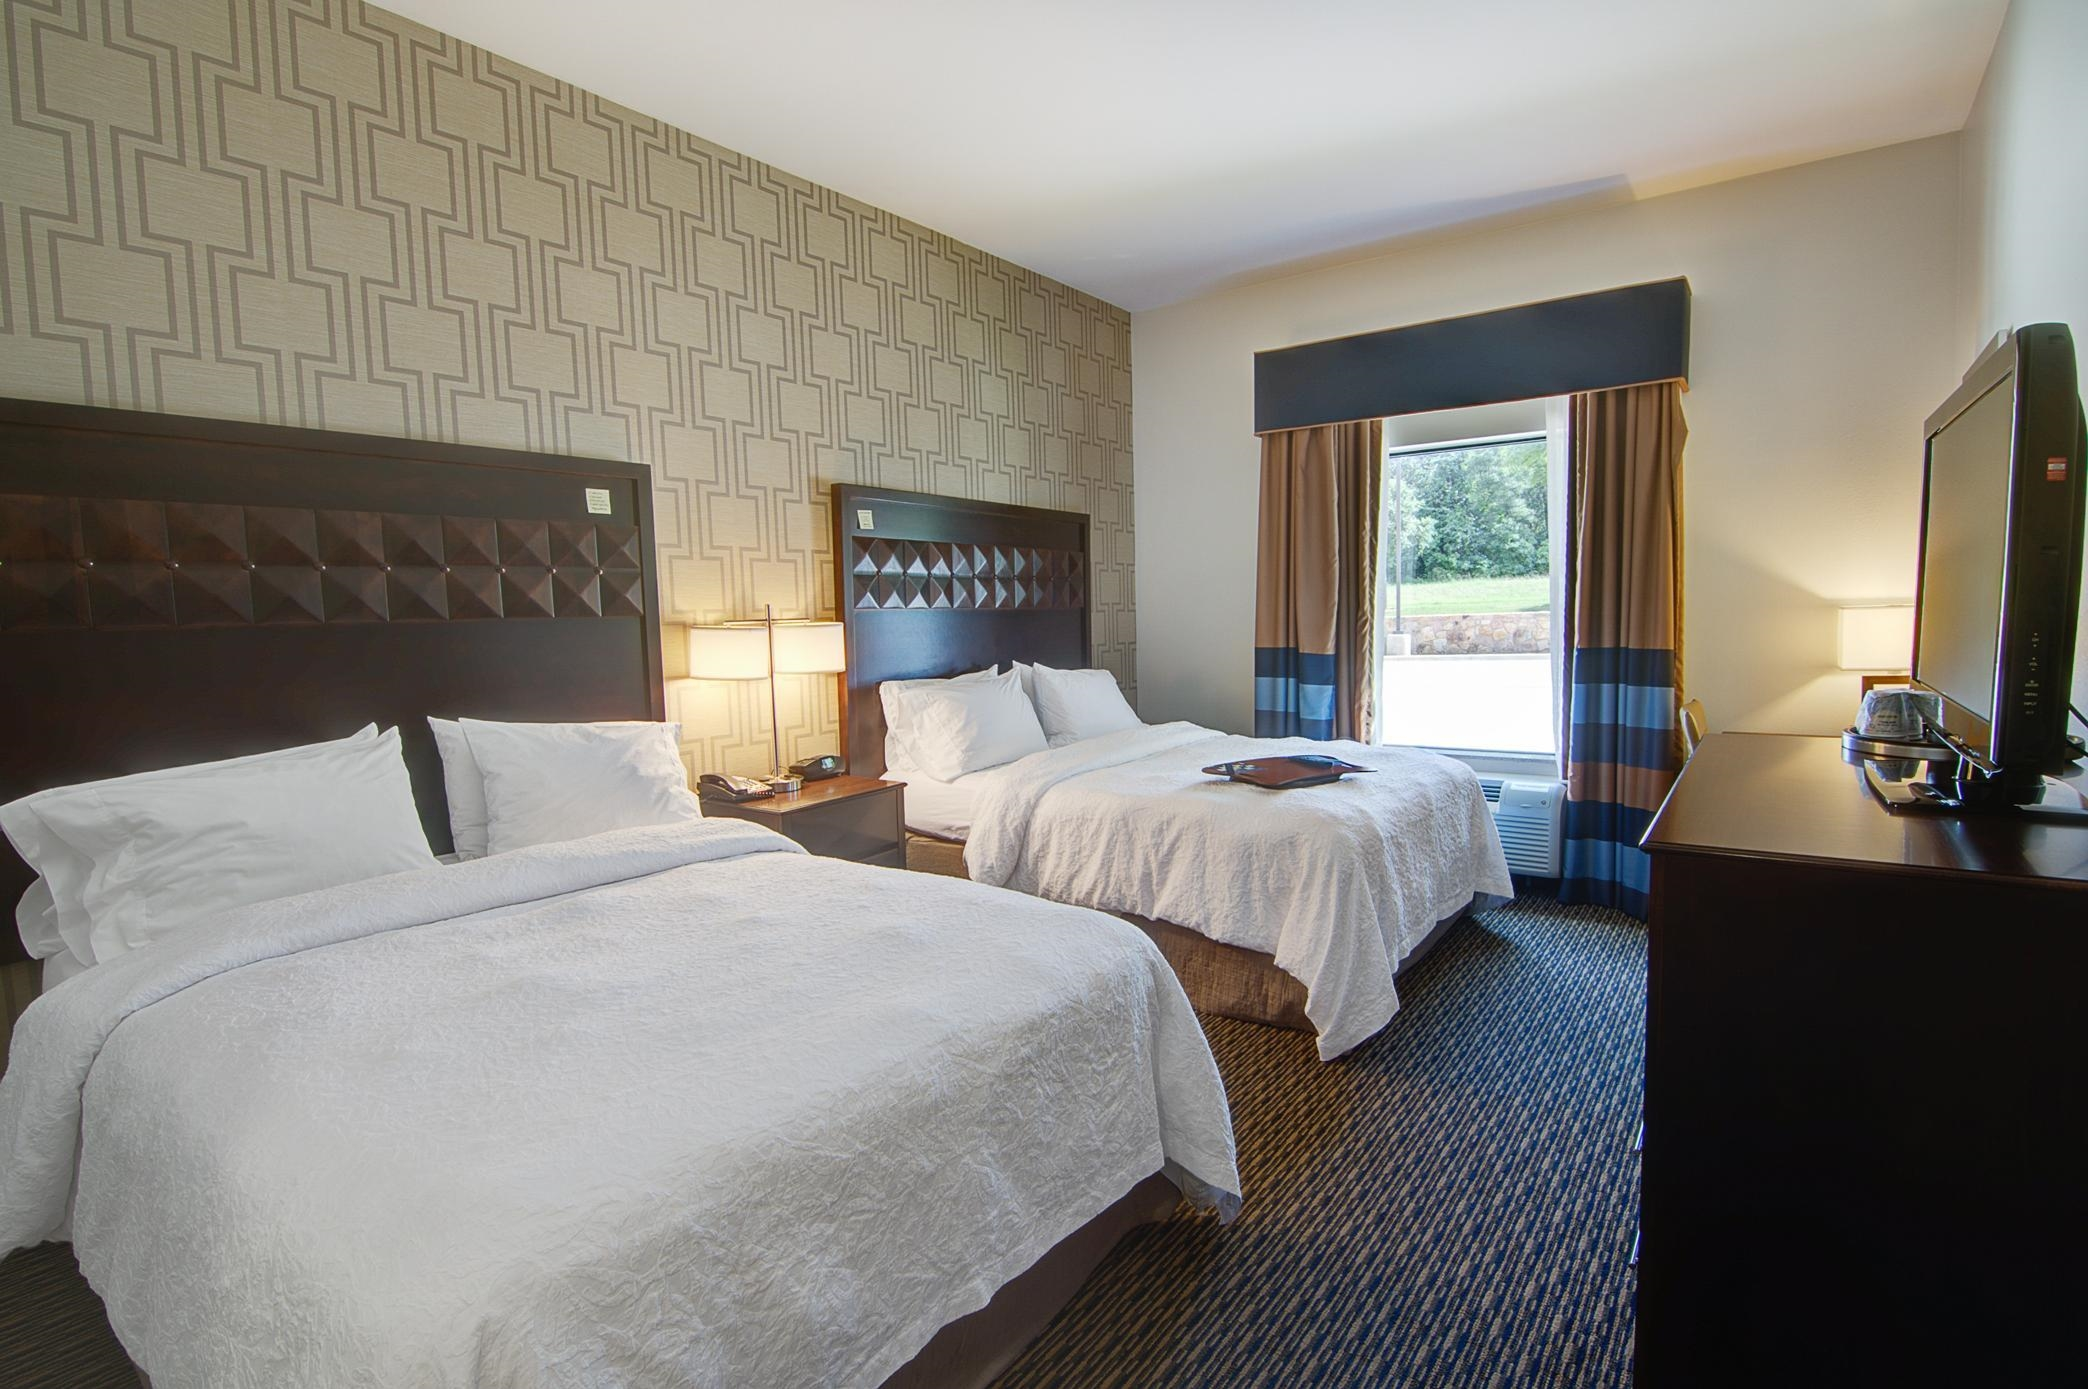 Hampton Inn & Suites Trophy Club - Fort Worth North image 22